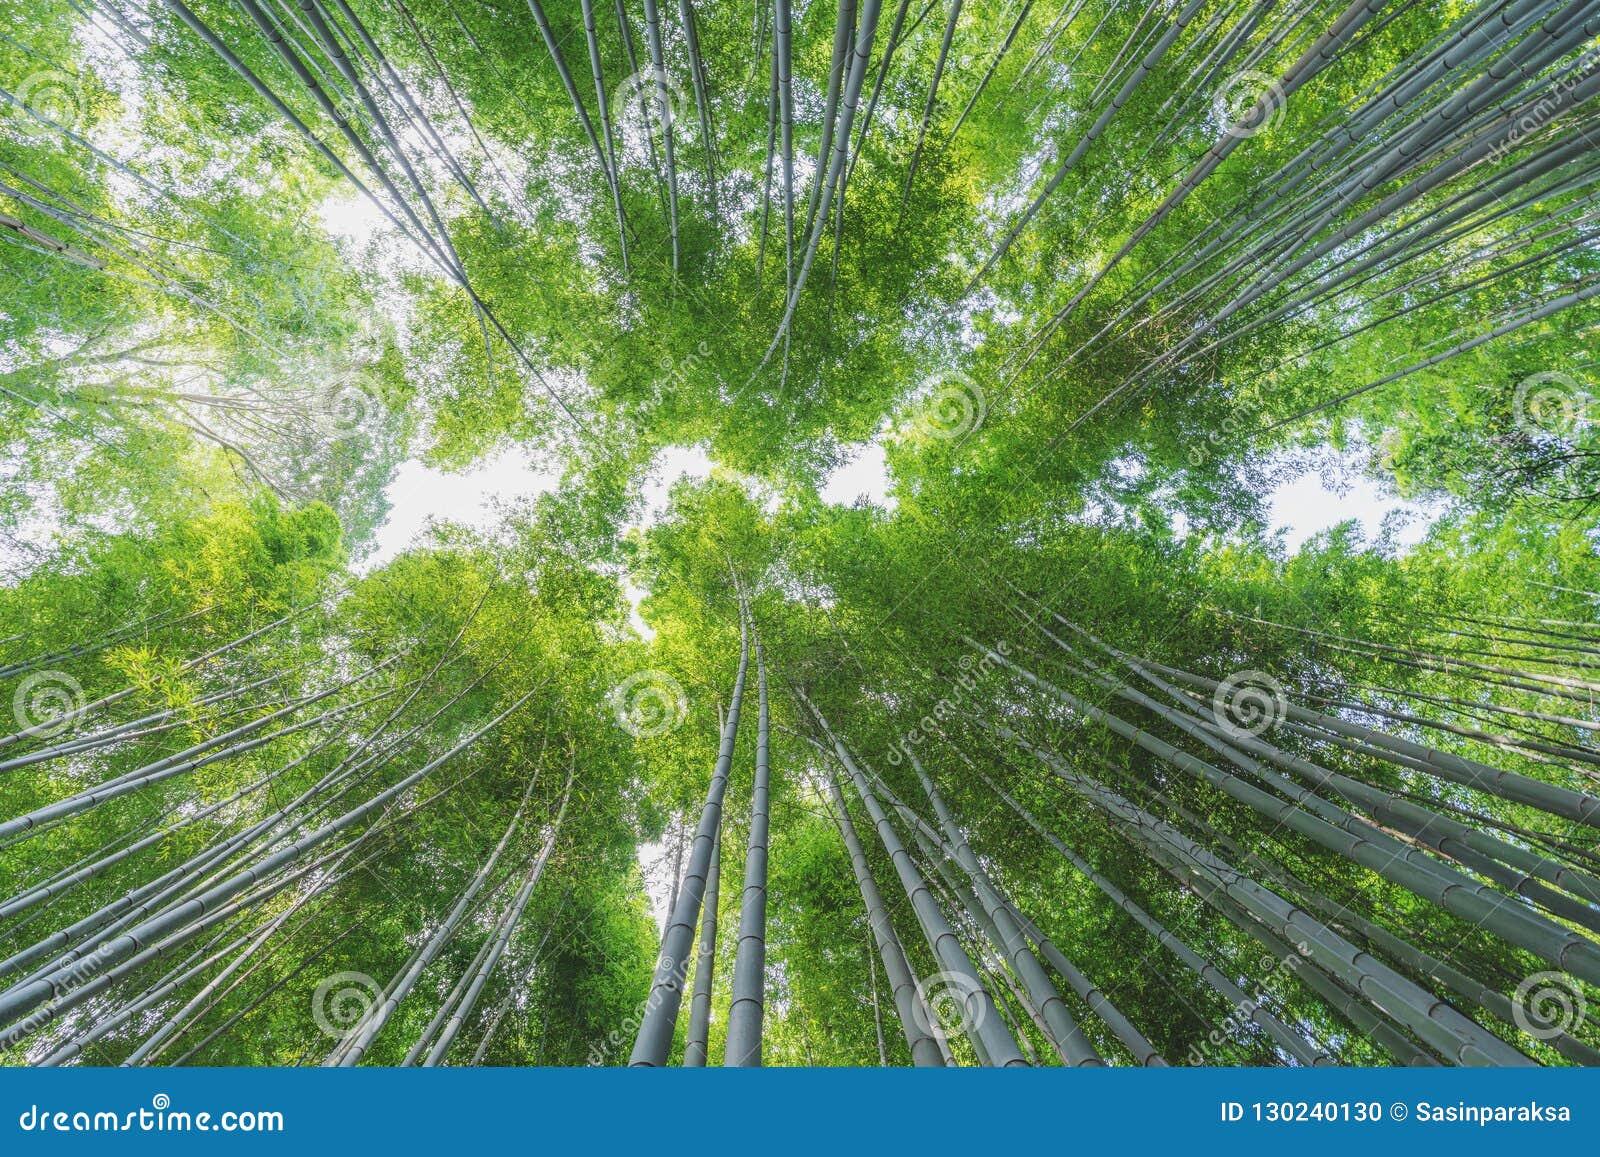 Bambuswaldung An Bambuswald Arashiyama In Kyoto Japan Stockfoto